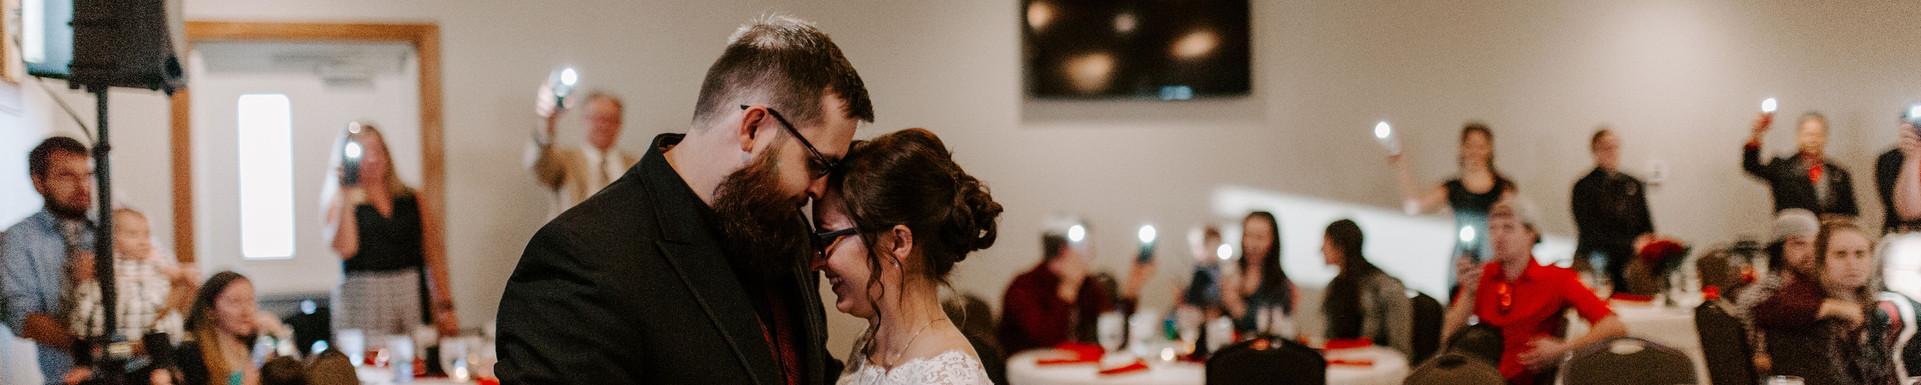 upton_wedding-288.jpg